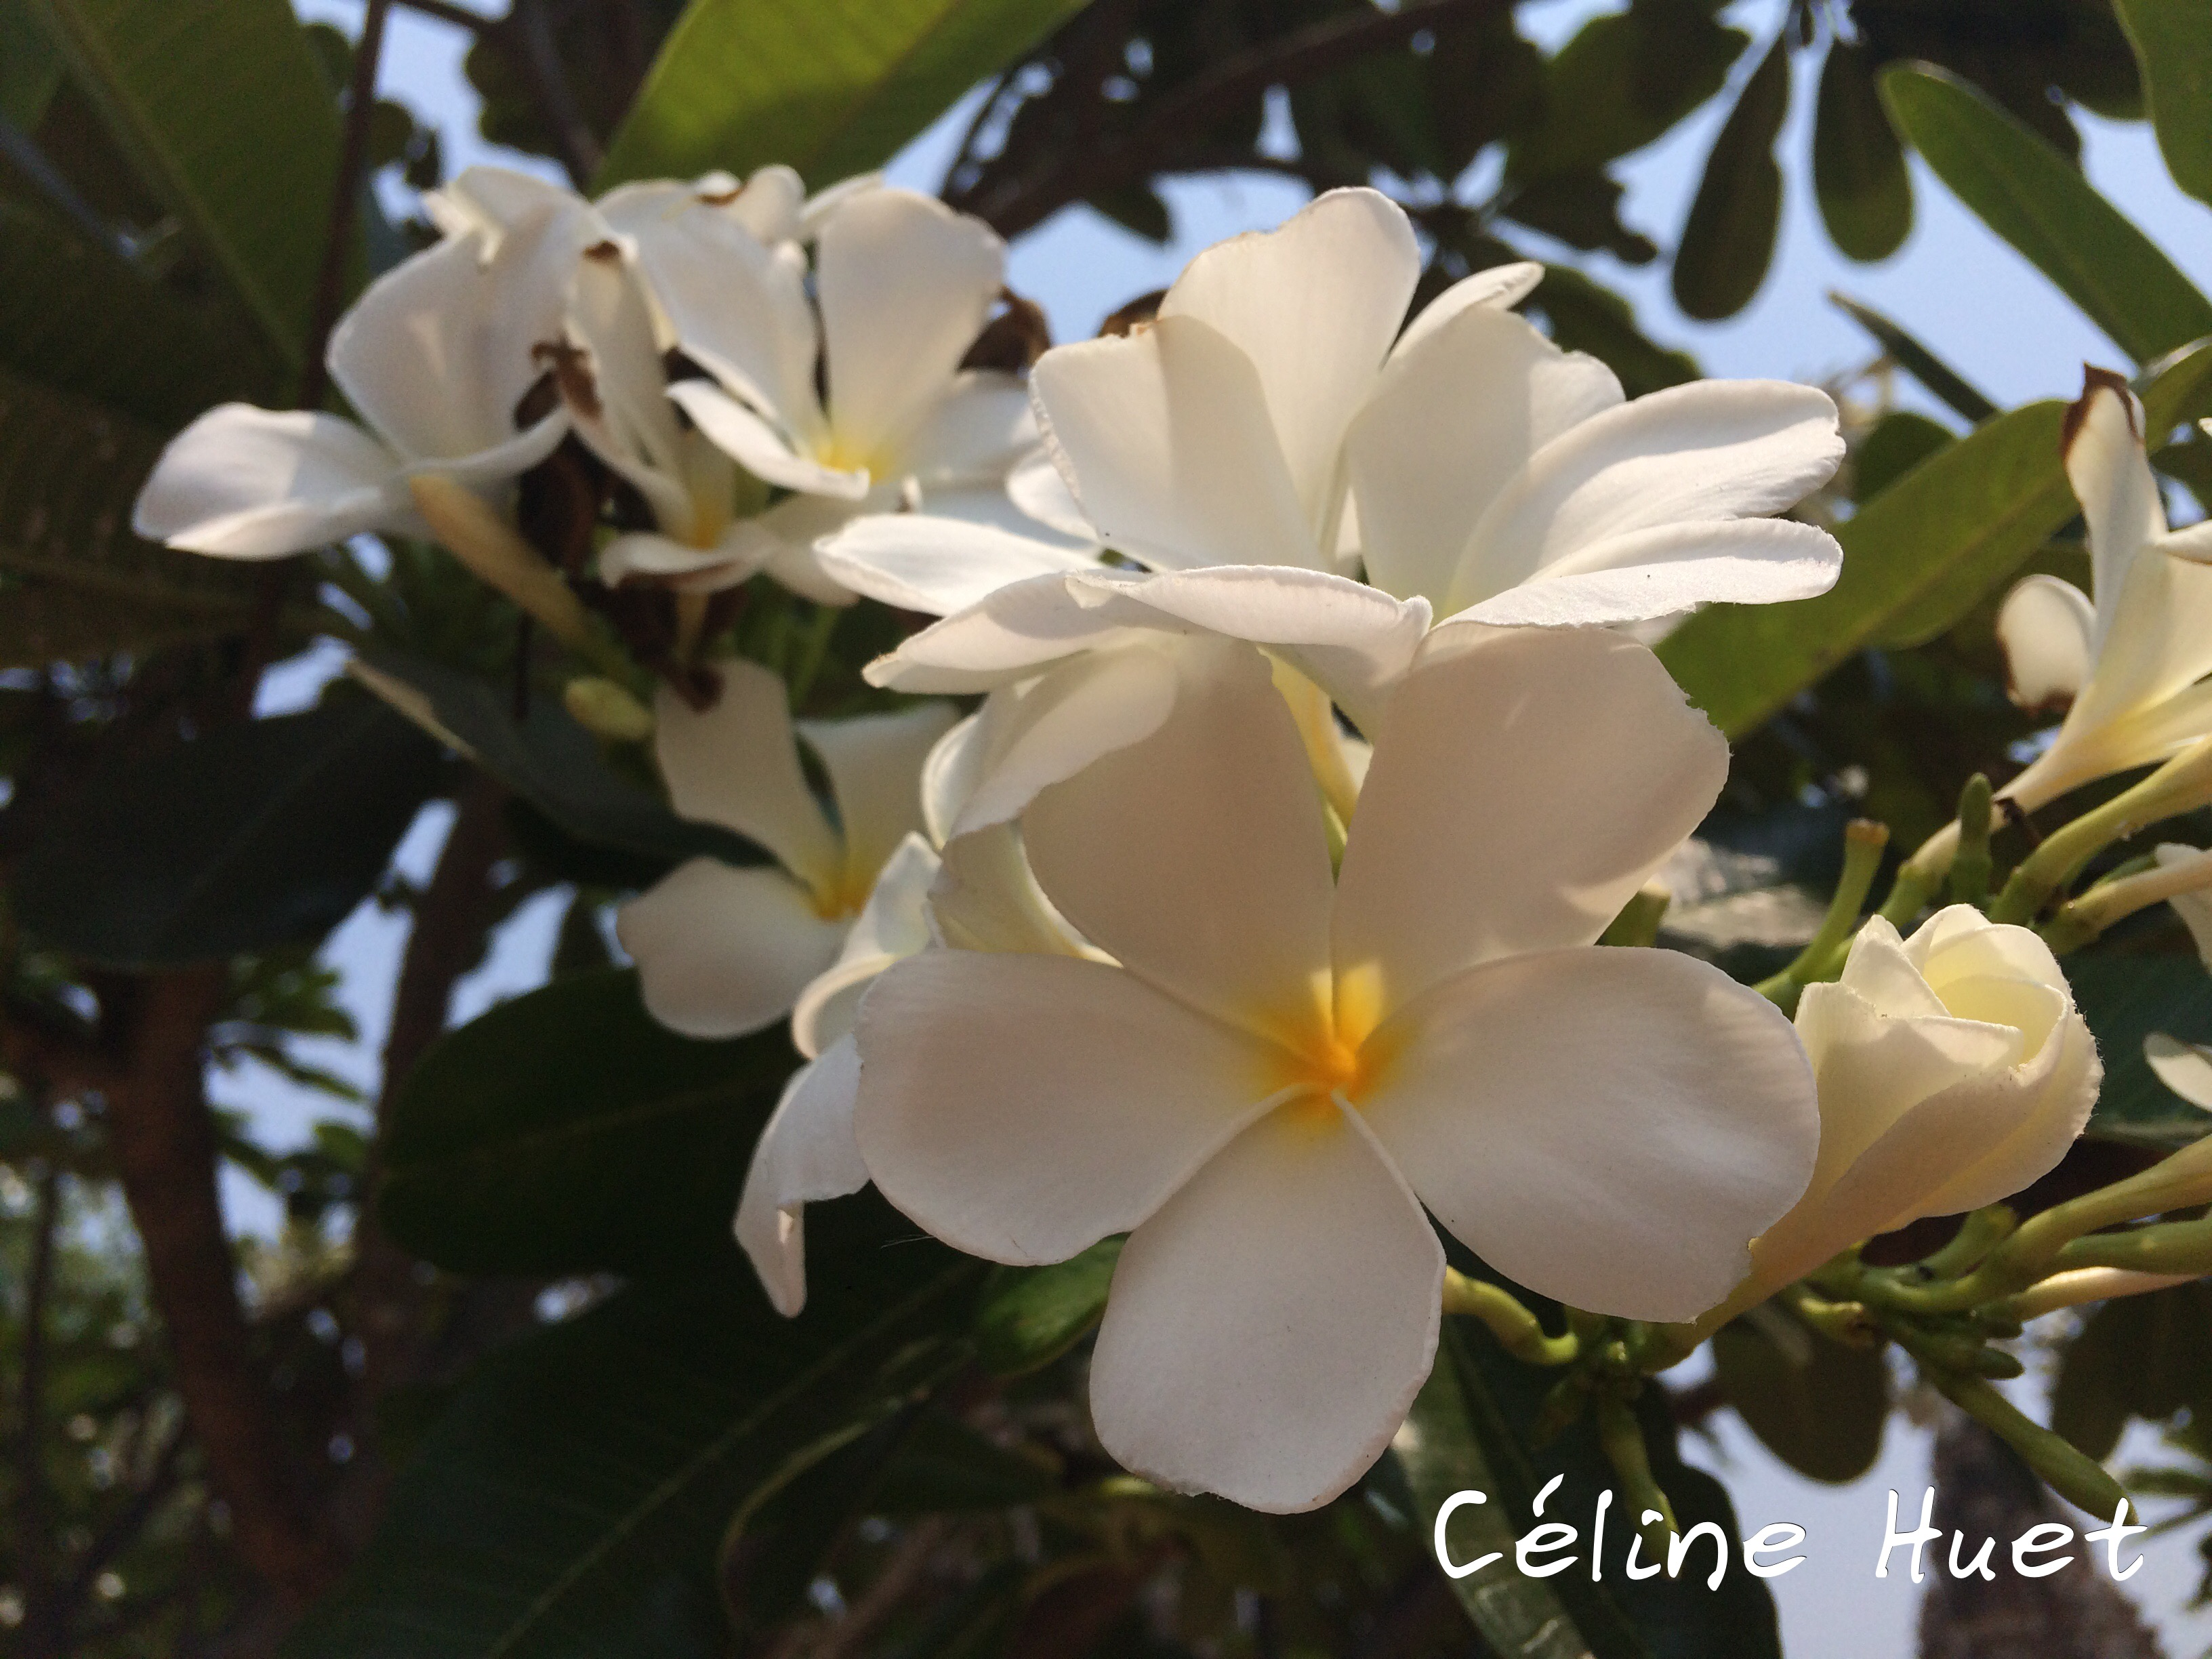 Fleurs de frangipanier Wat Chai Watthanaram Ayutthaya Thaïlande Asie